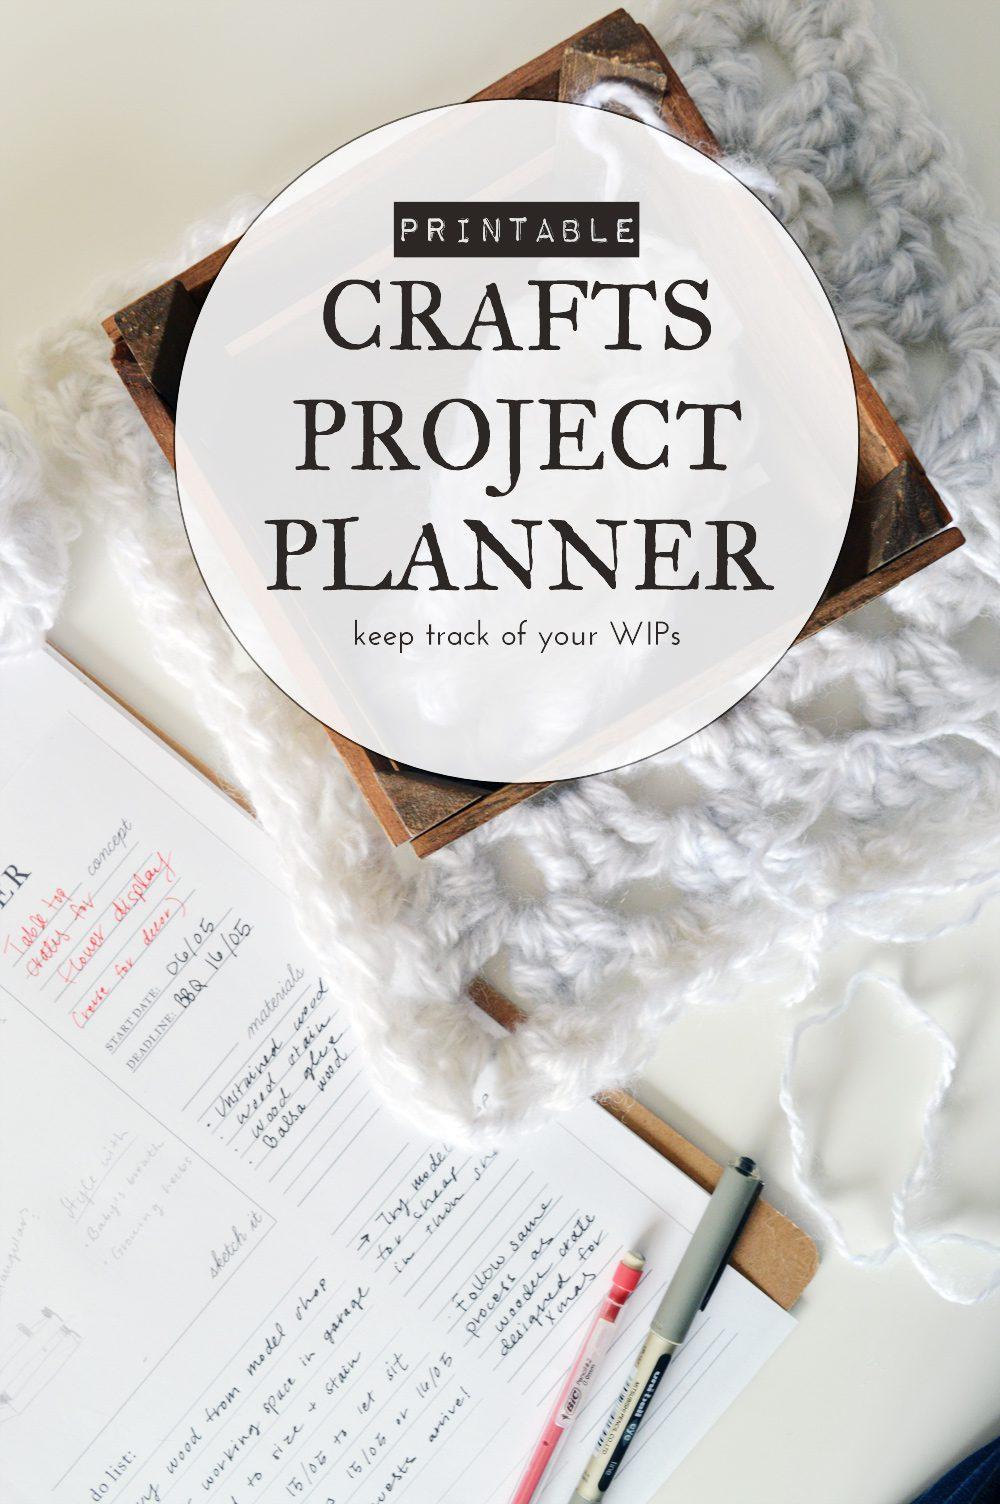 Printable craft project planner |  #crafts #DIY #printable #freebie